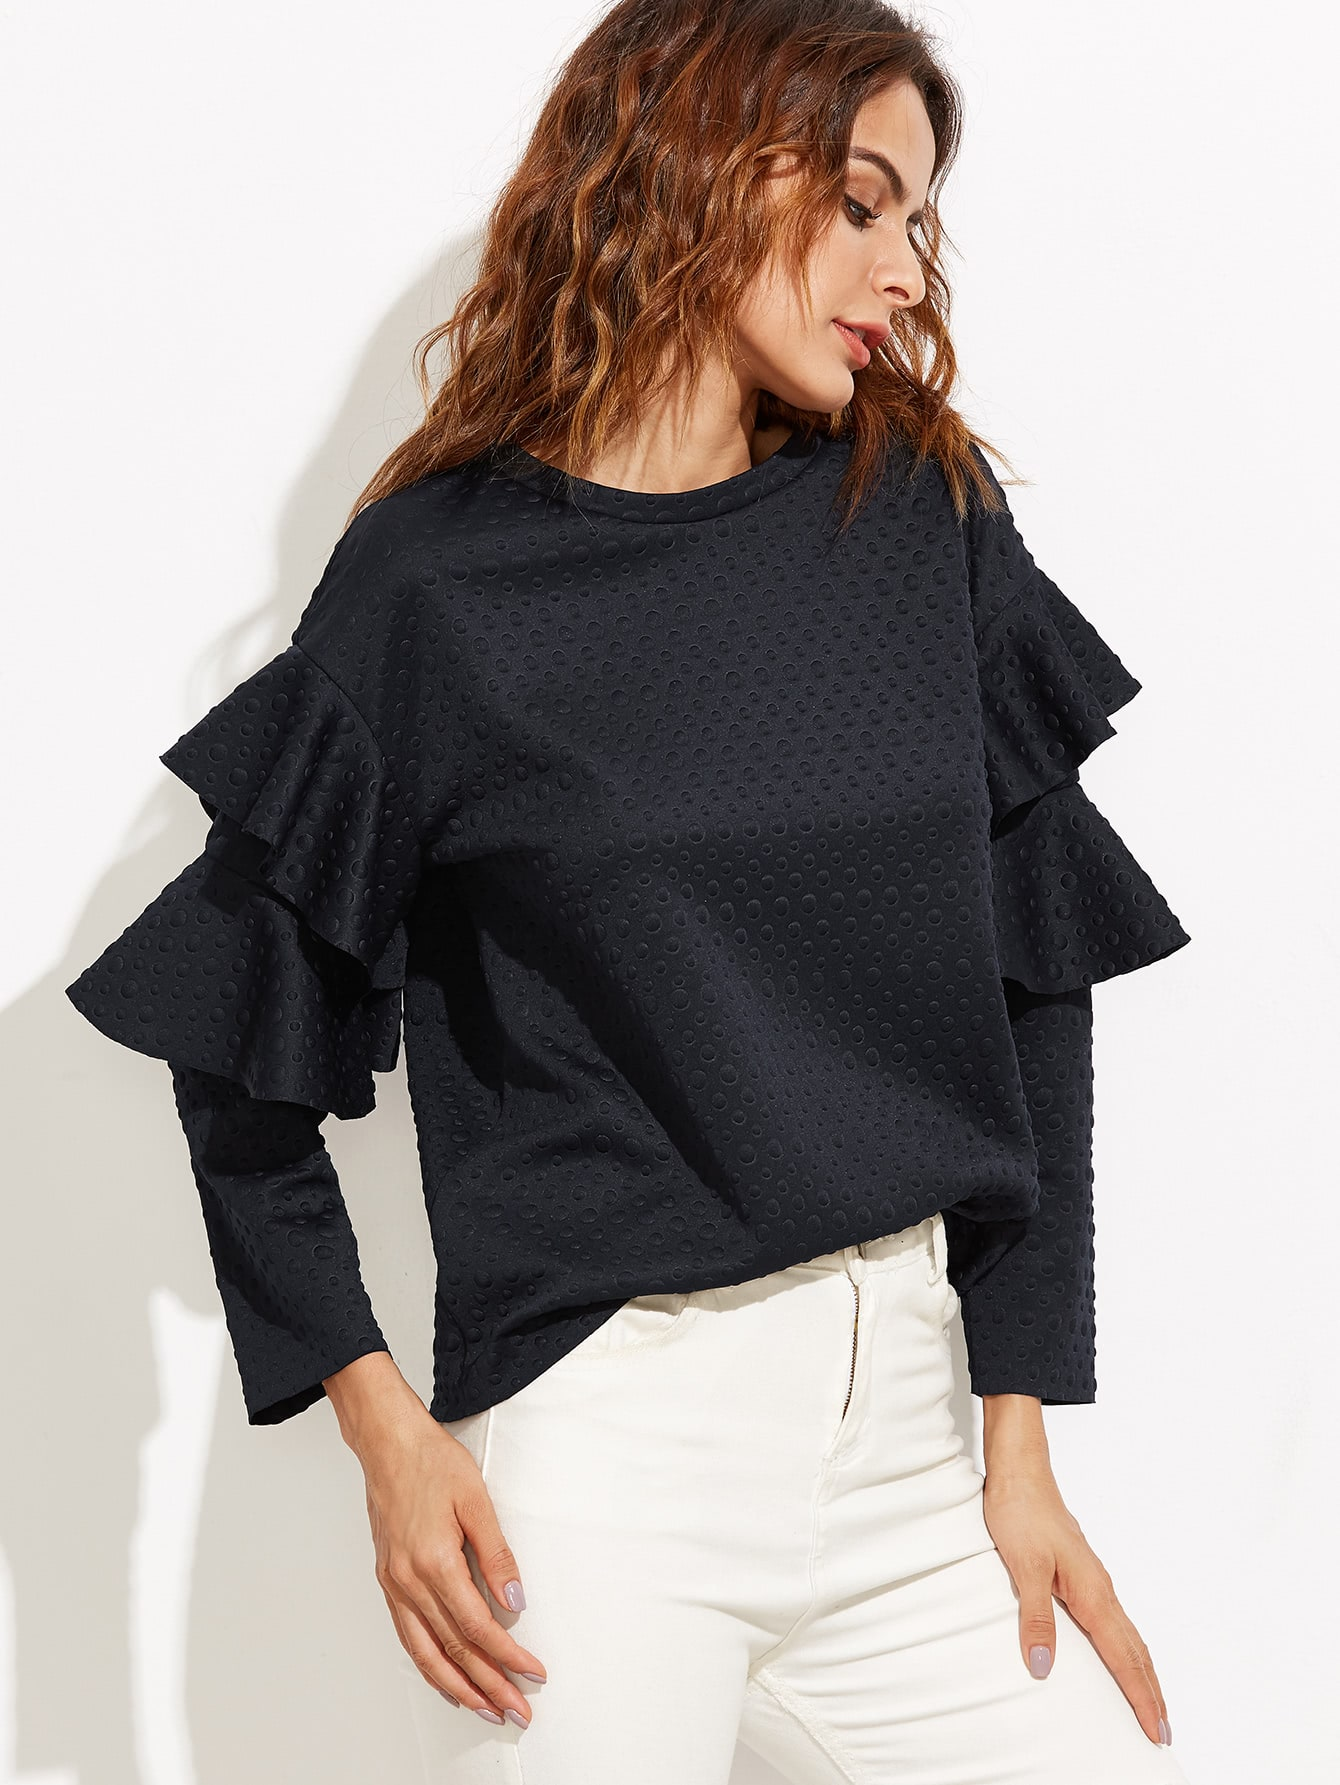 blouse160920702_2